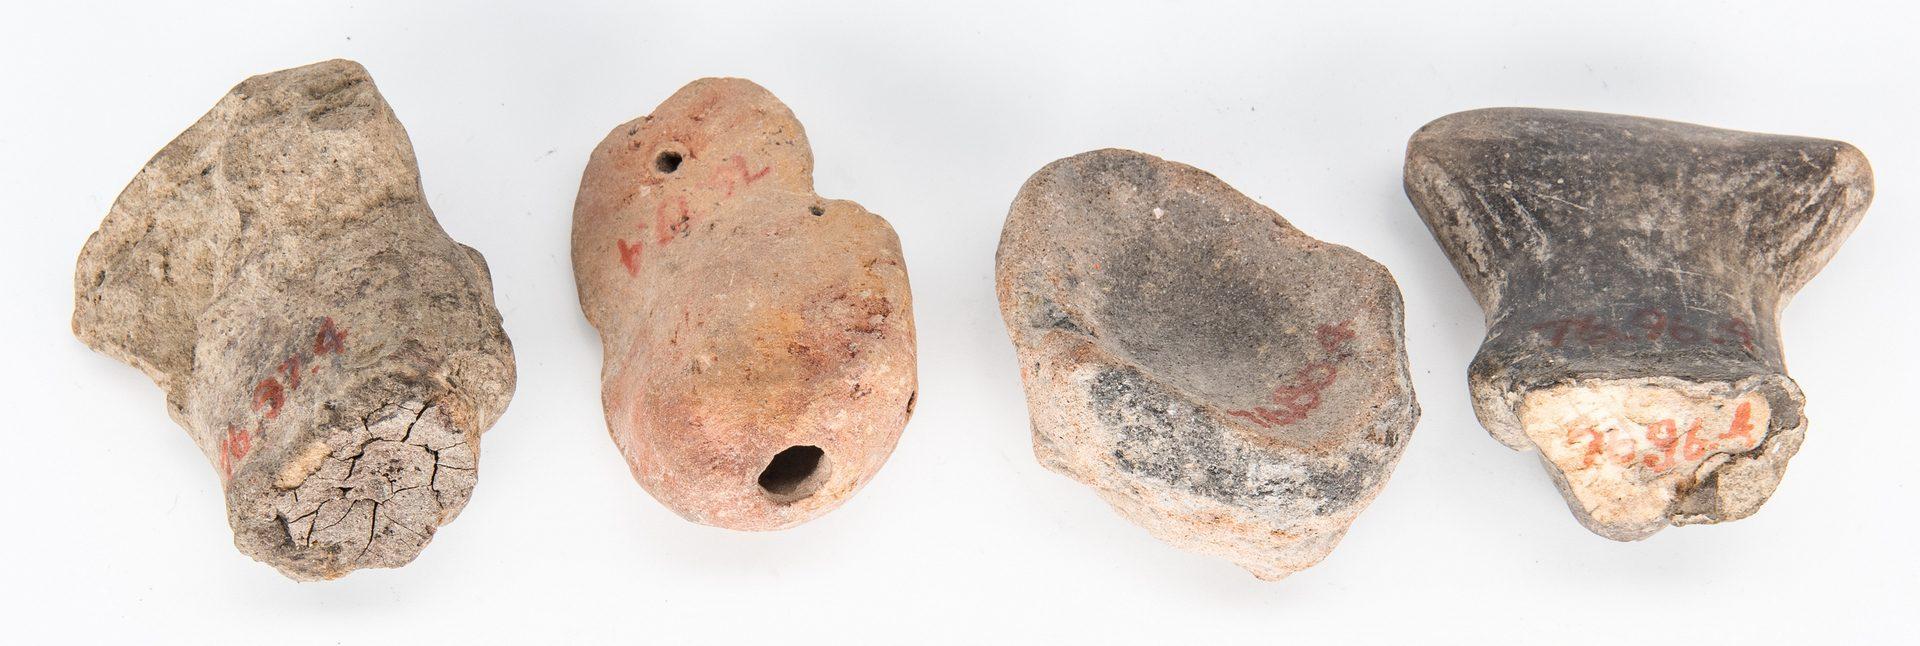 Lot 292: 29 Pre-Columbian Human Effigies, incl. Jama Coaque